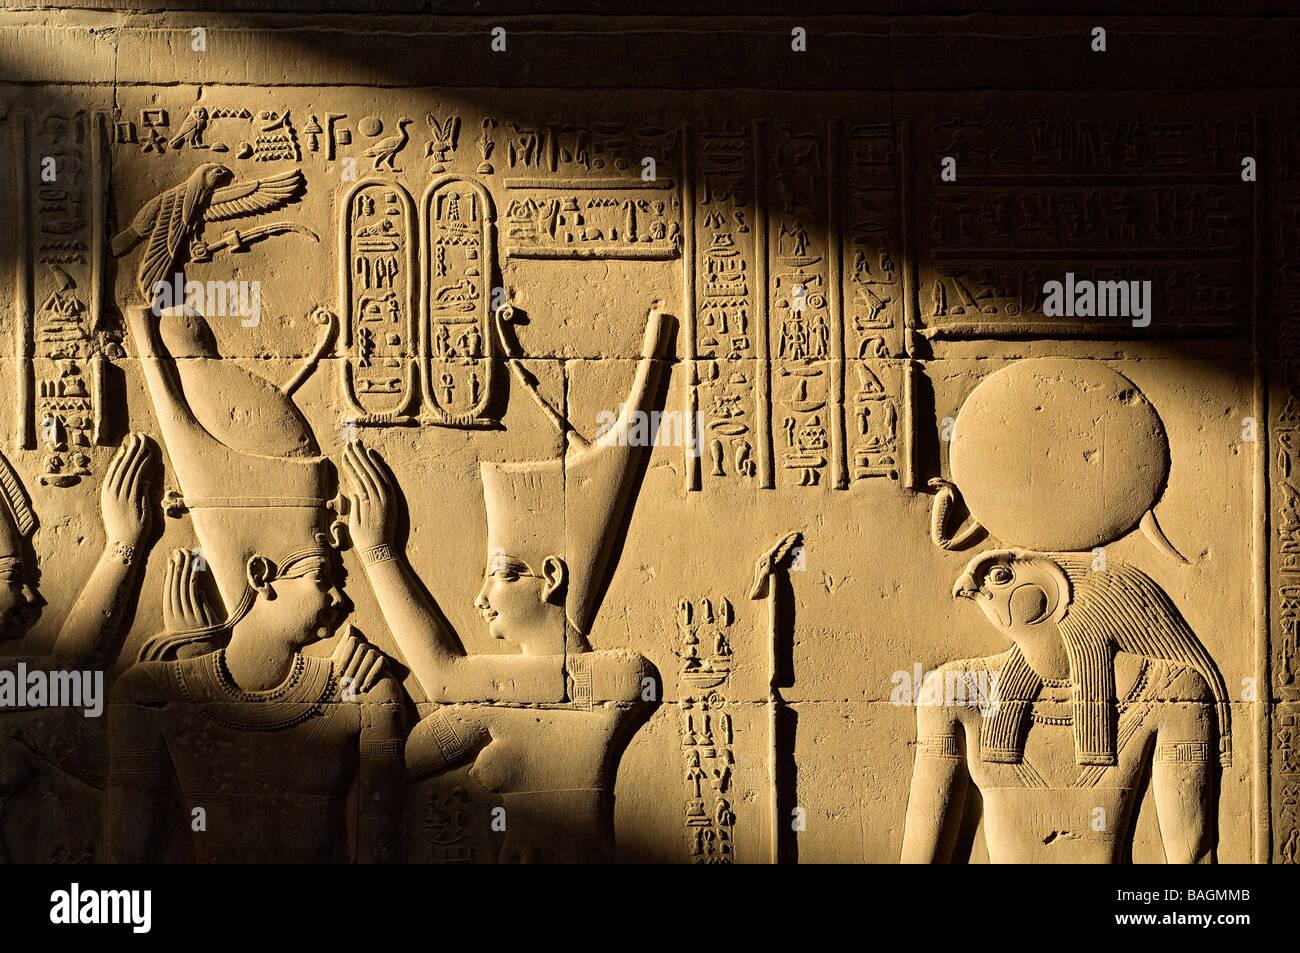 Ra Egyptian God Stock Photos & Ra Egyptian God Stock